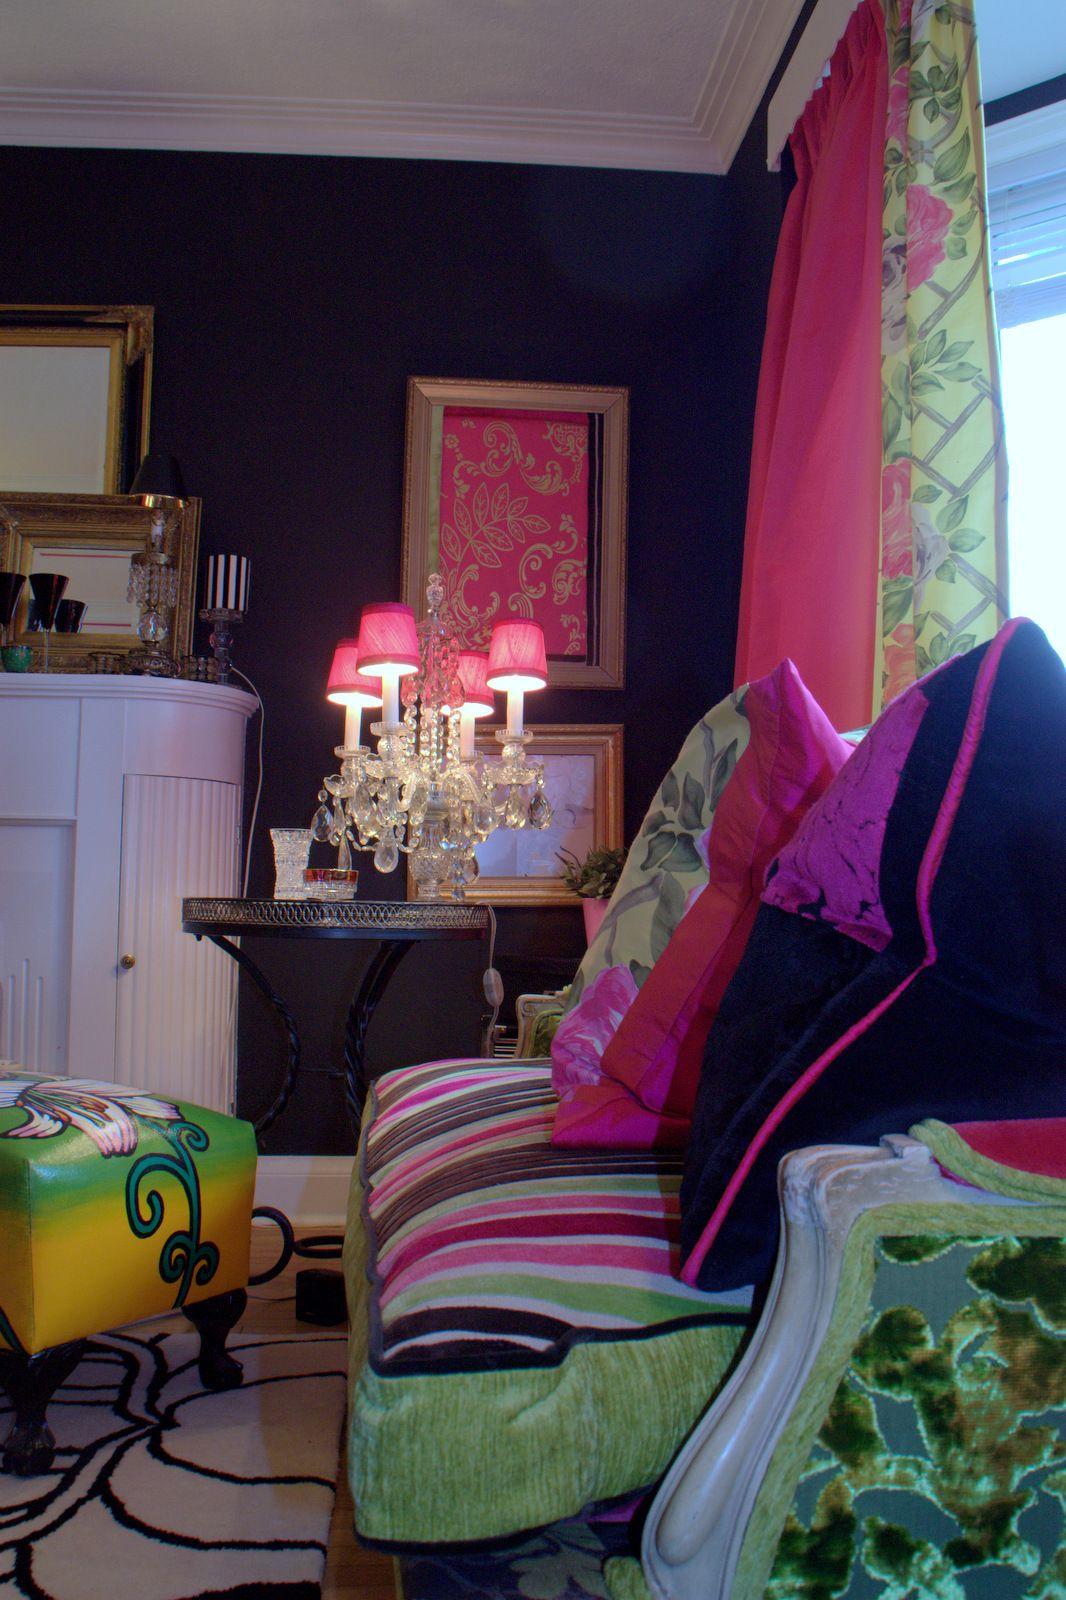 fuschia furniture. My Bohemian Style- I Decorated Home With Black And Fuschia Walls Antique Crystal Lighting, Custom Made Furniture, Drapery Cushions. Furniture